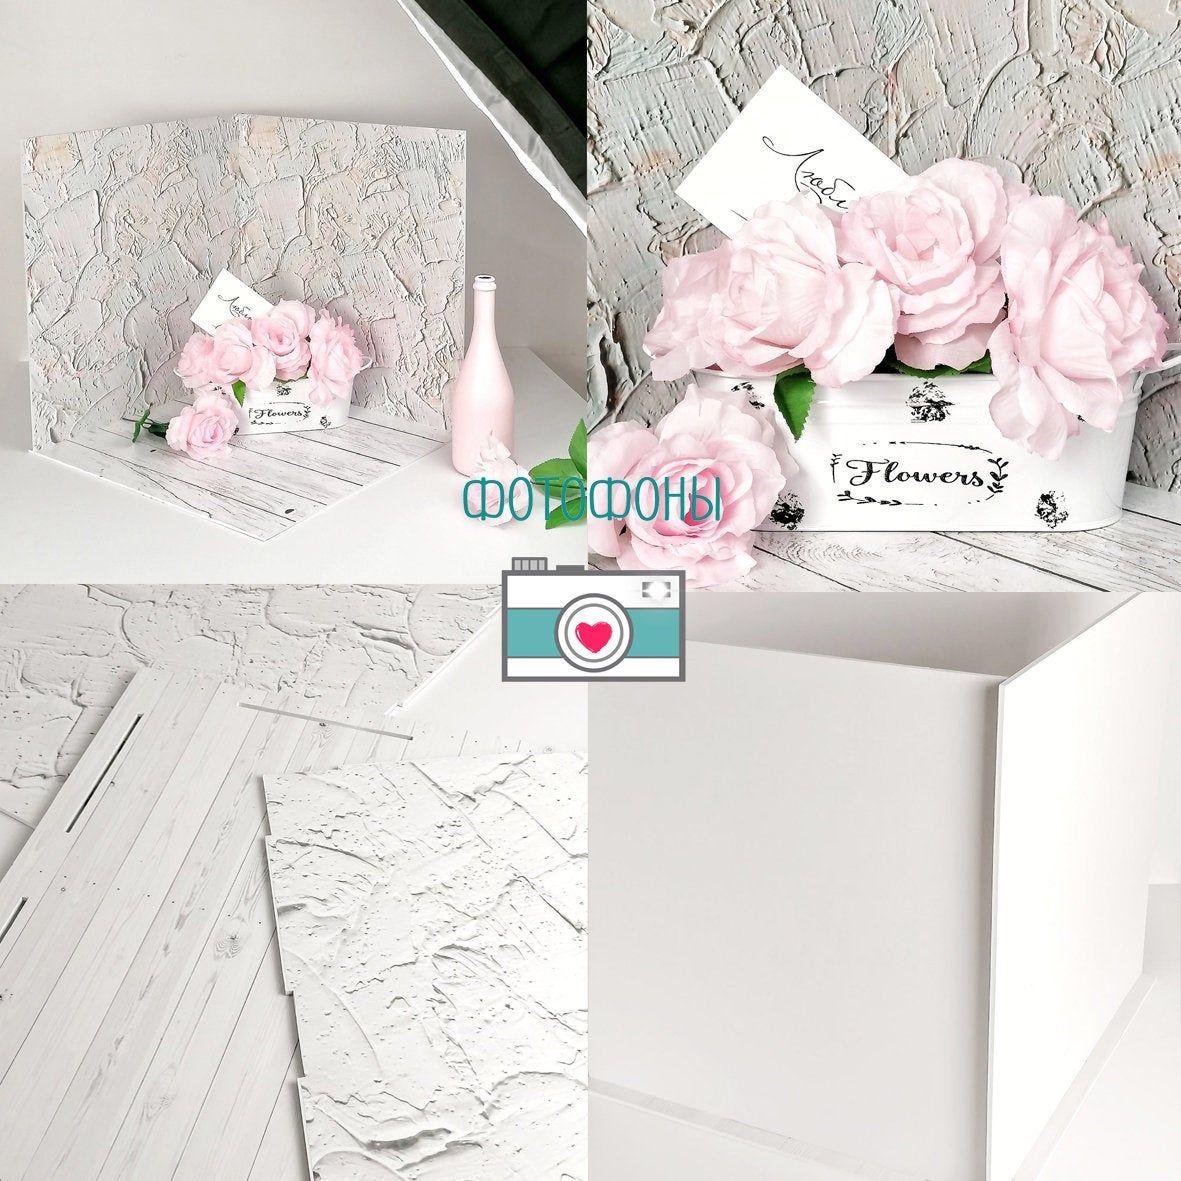 Plaster, Texture, Old Floor Boards, 3D Background, Plastic